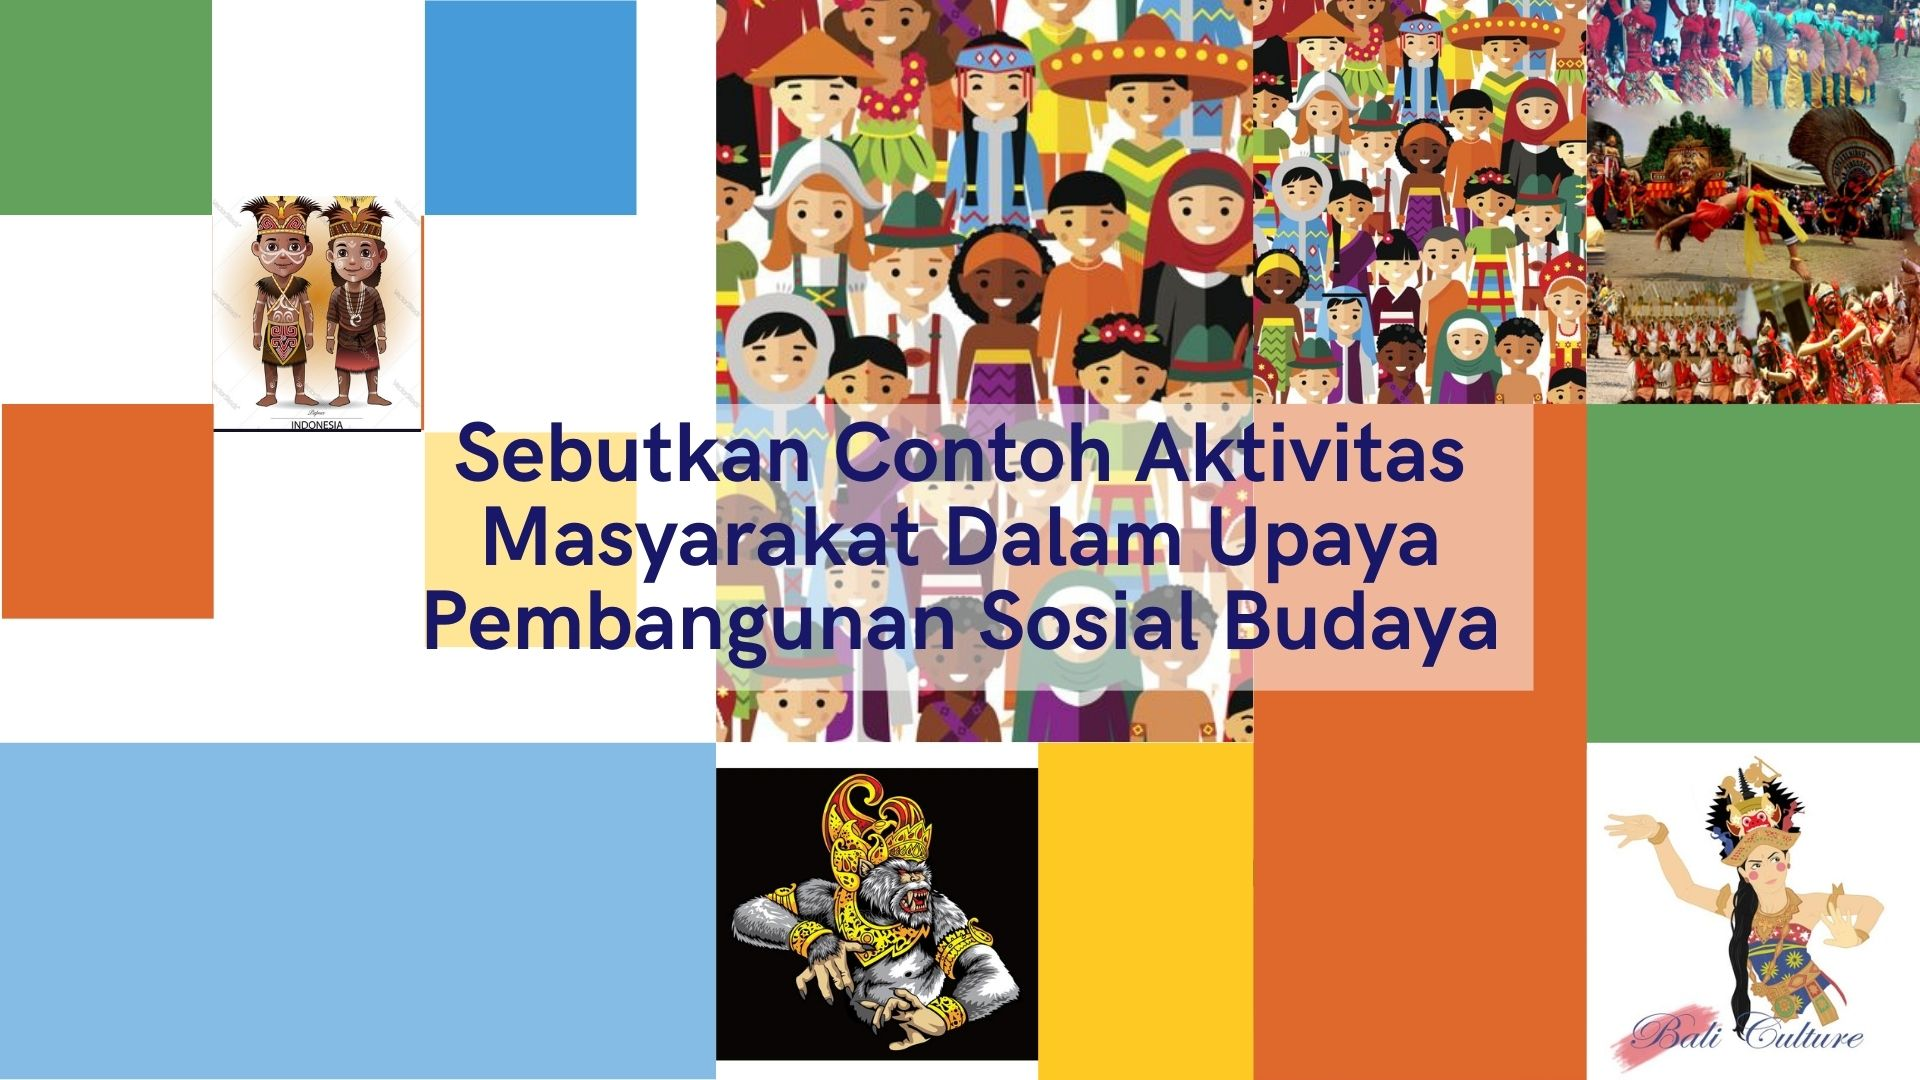 sebutkan contoh aktivitas masyarakat dalam upaya pembangunan sosial budaya